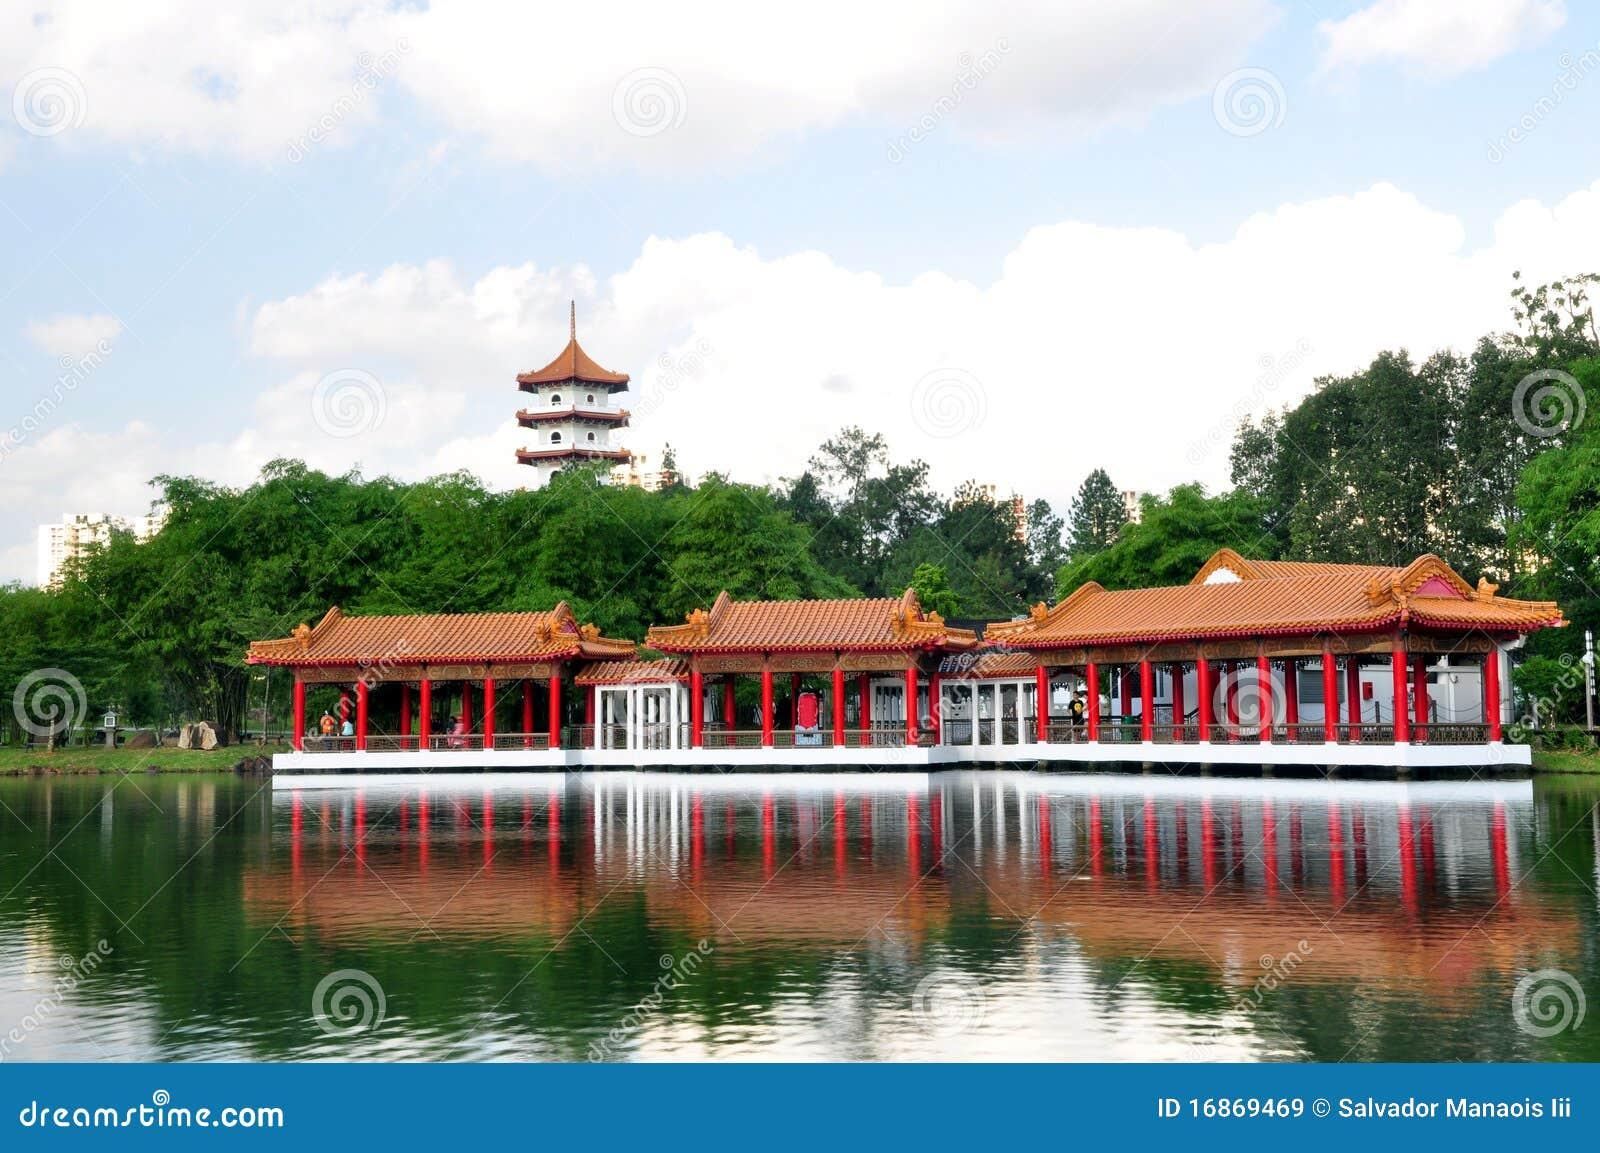 Casa de chá, jardim chinês